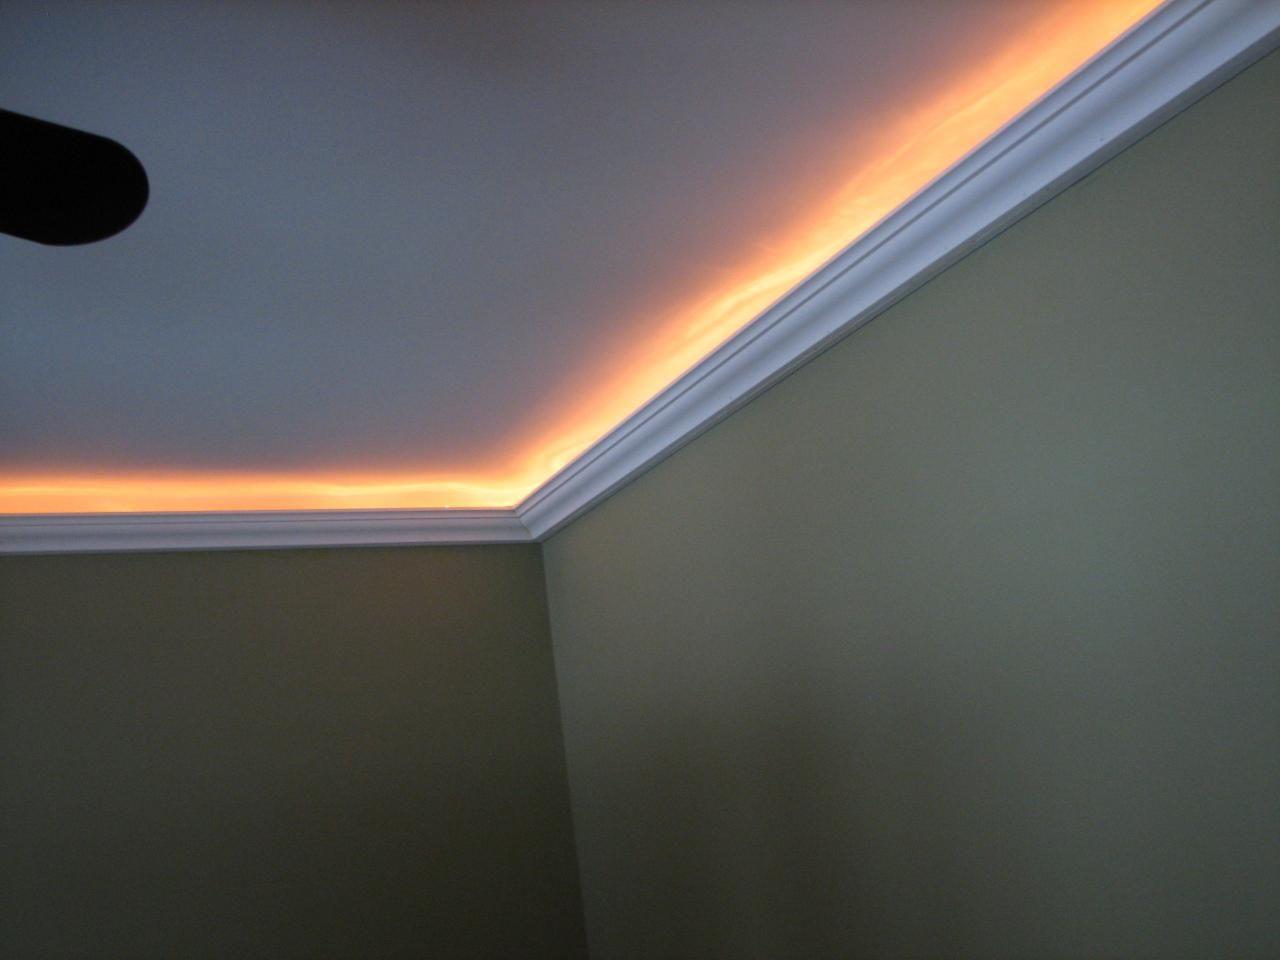 35 Ceiling Corner Crown Molding Ideas Crown molding